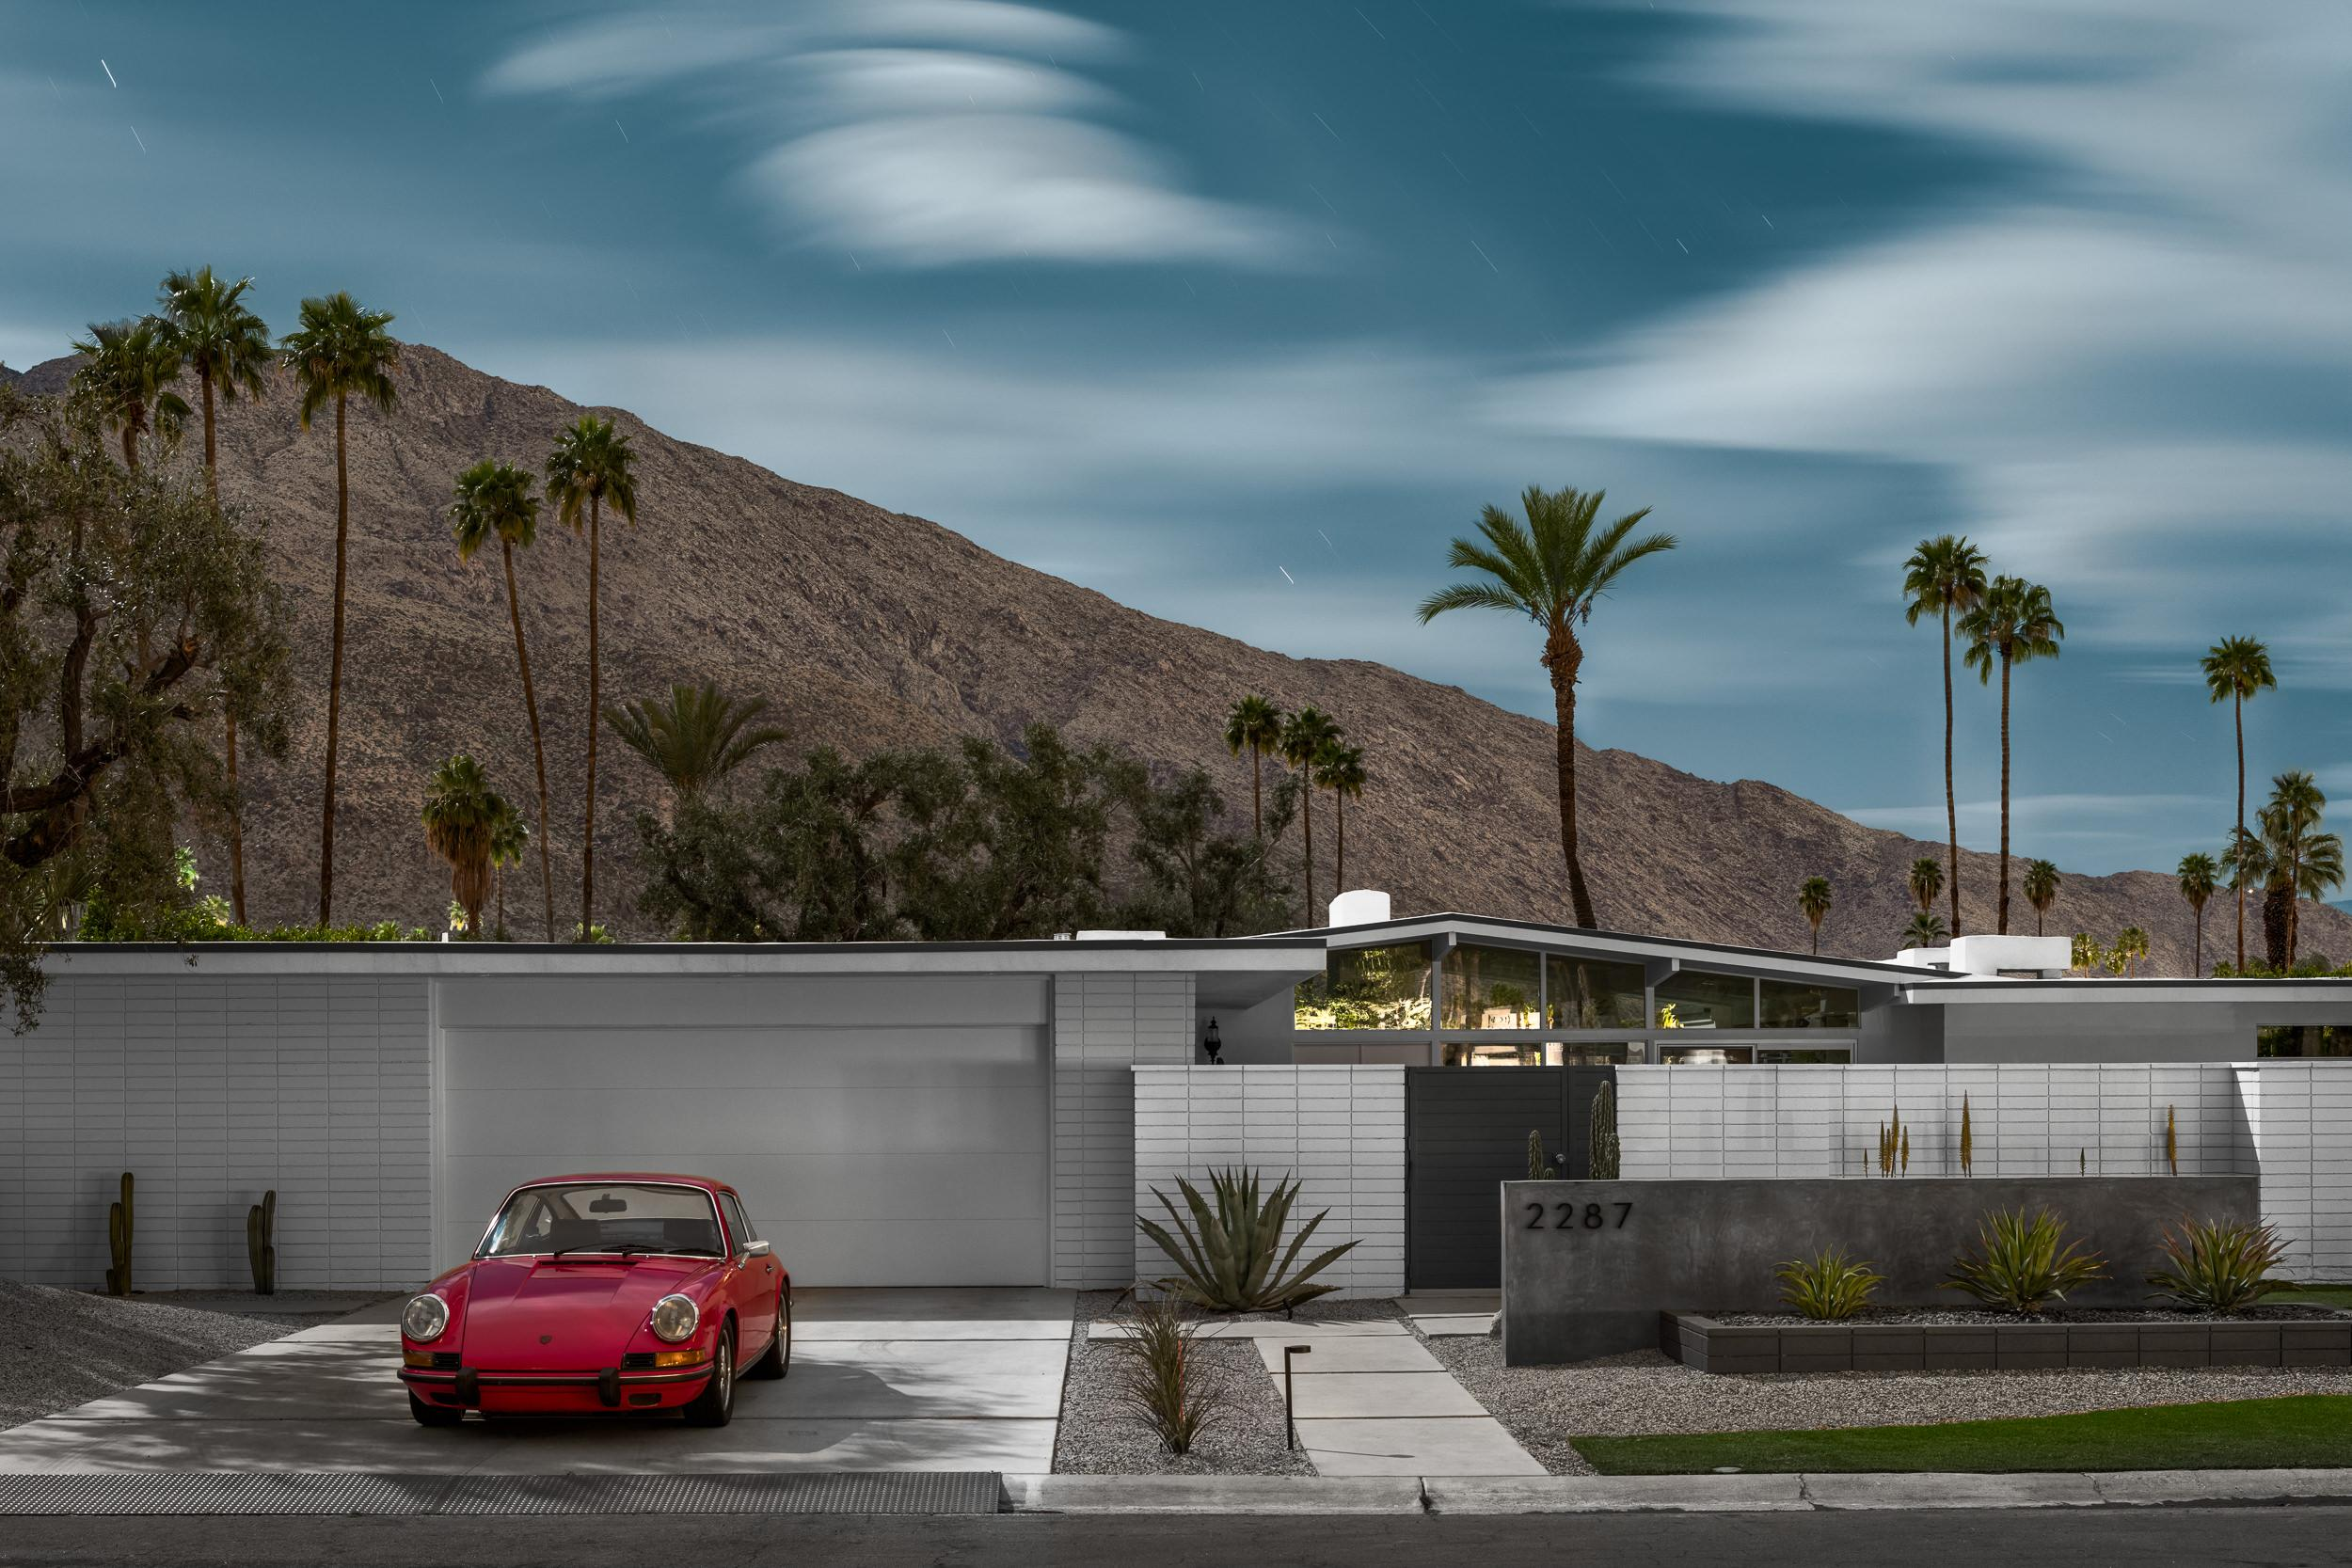 Mid Century Modern Architecture Photograph - Raspberry Camino - Tom Blachford's